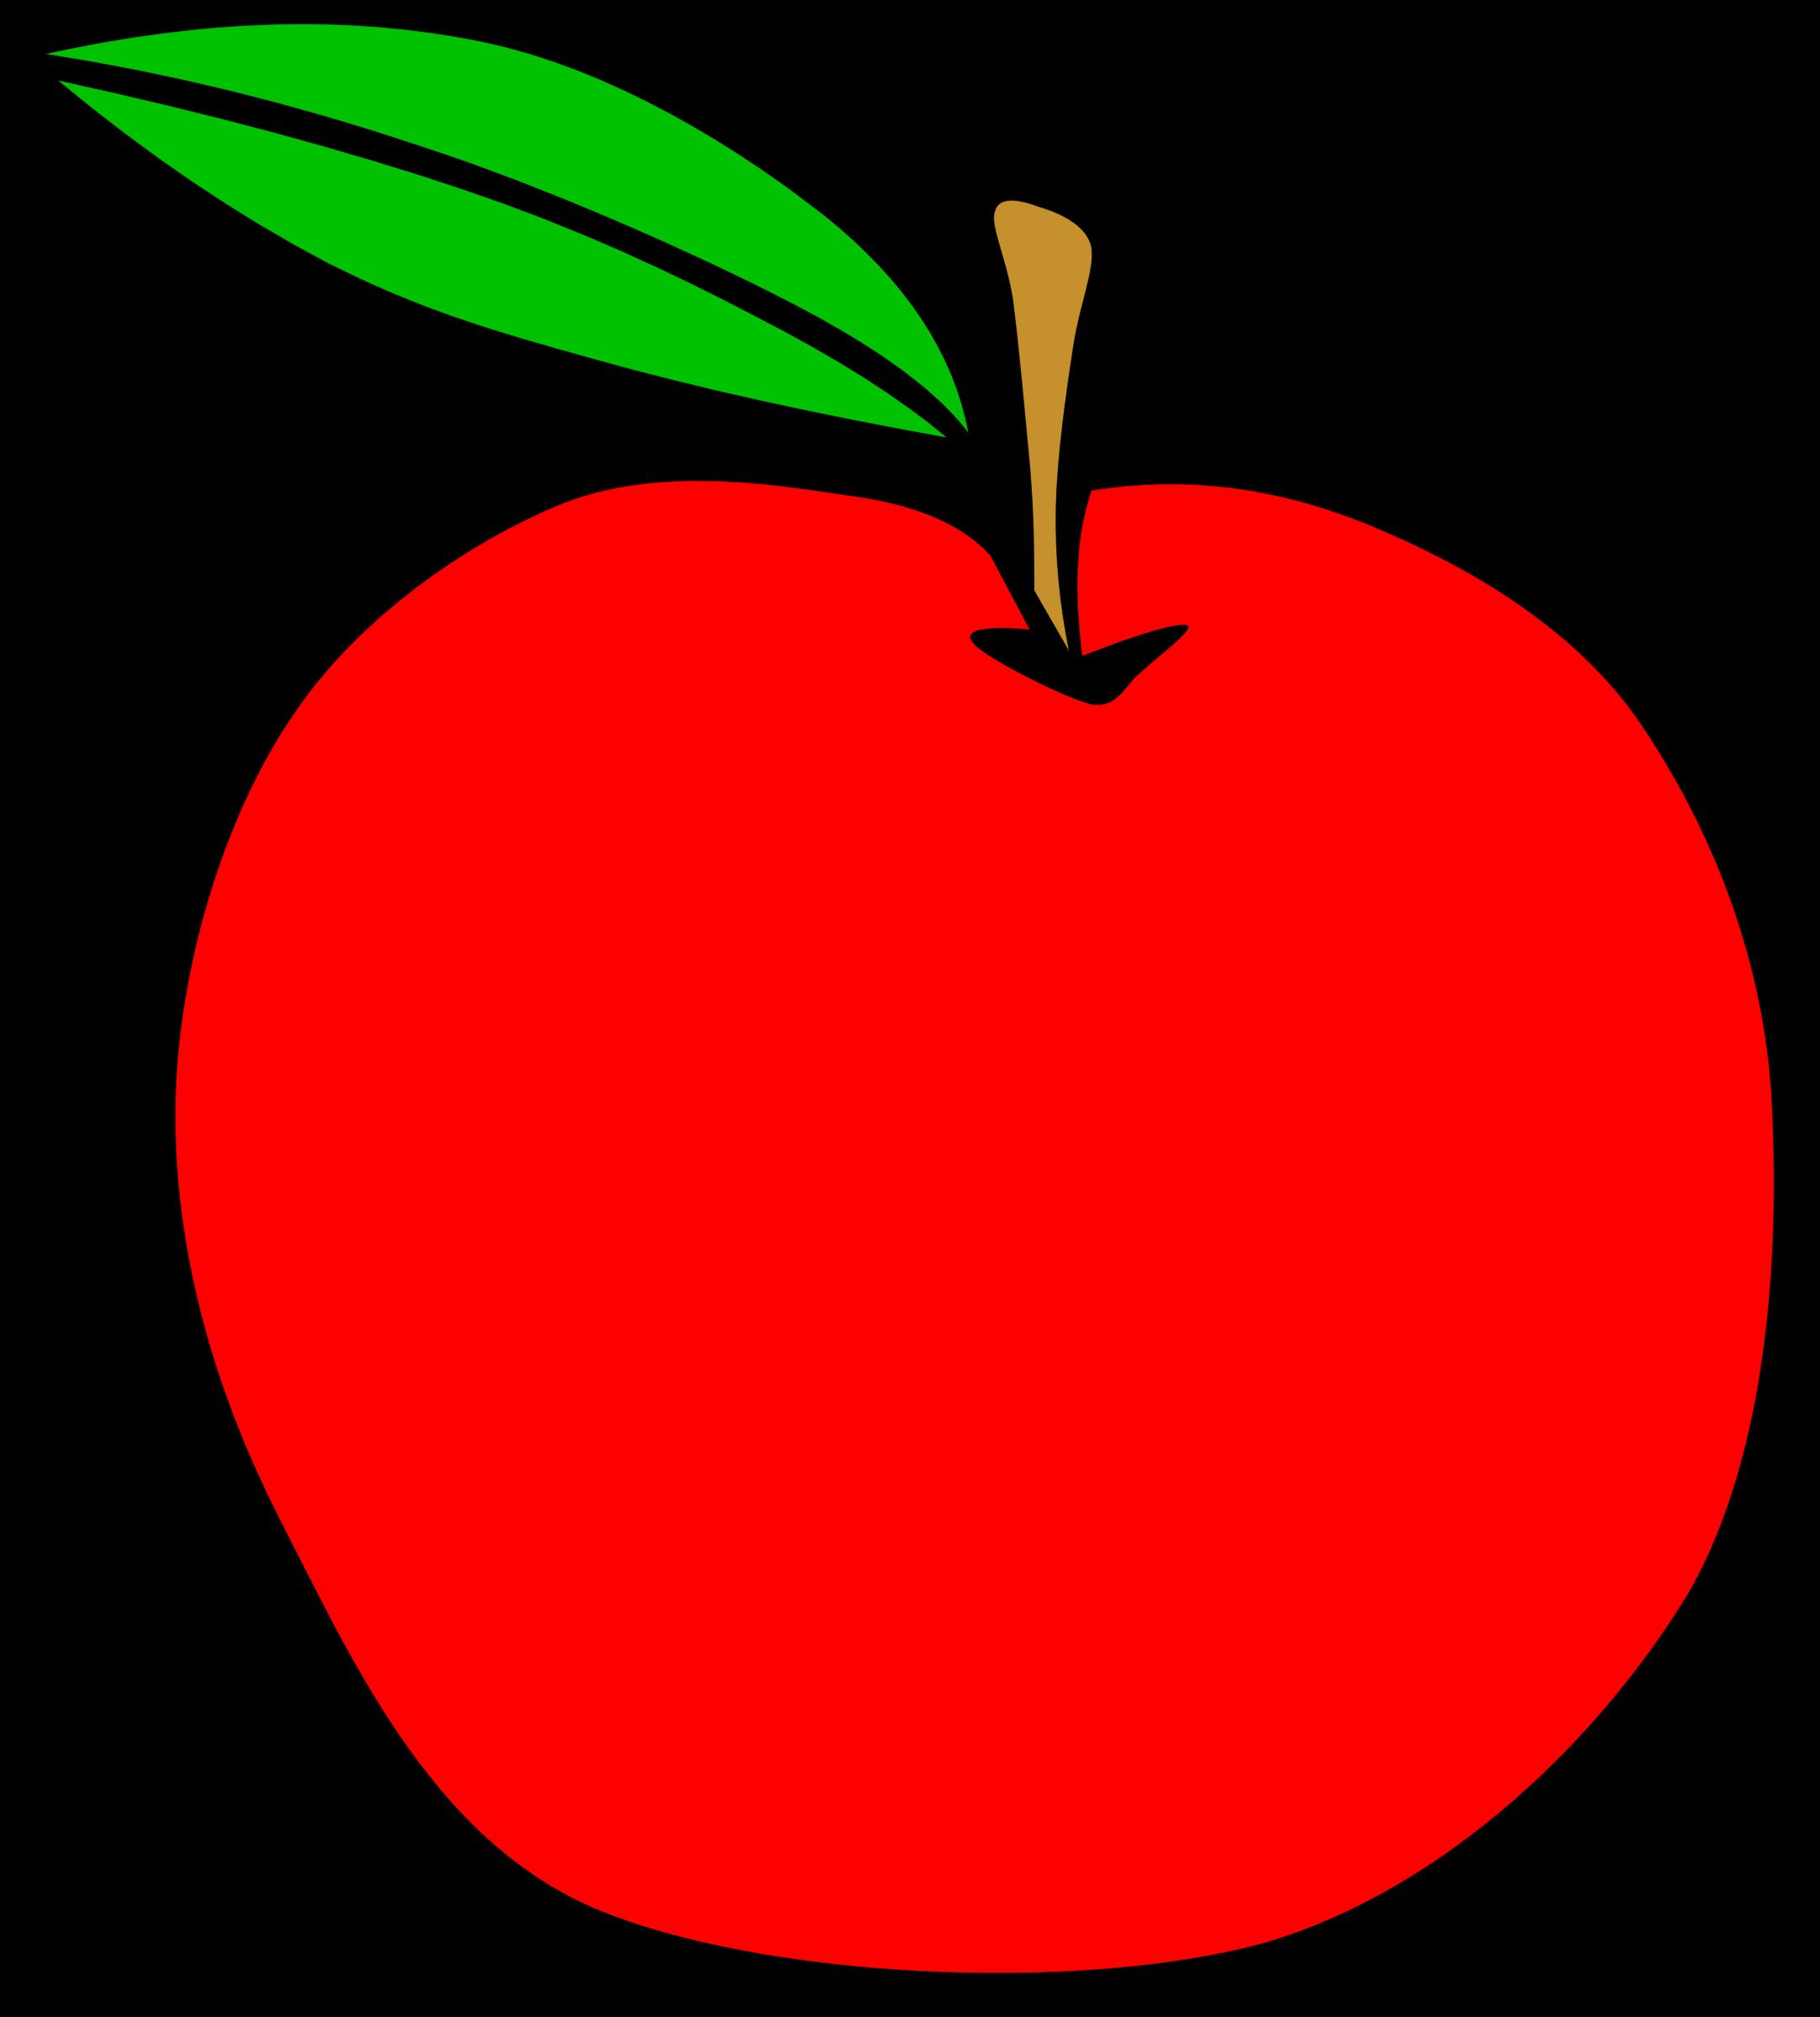 Clipart Of Apple Fruit